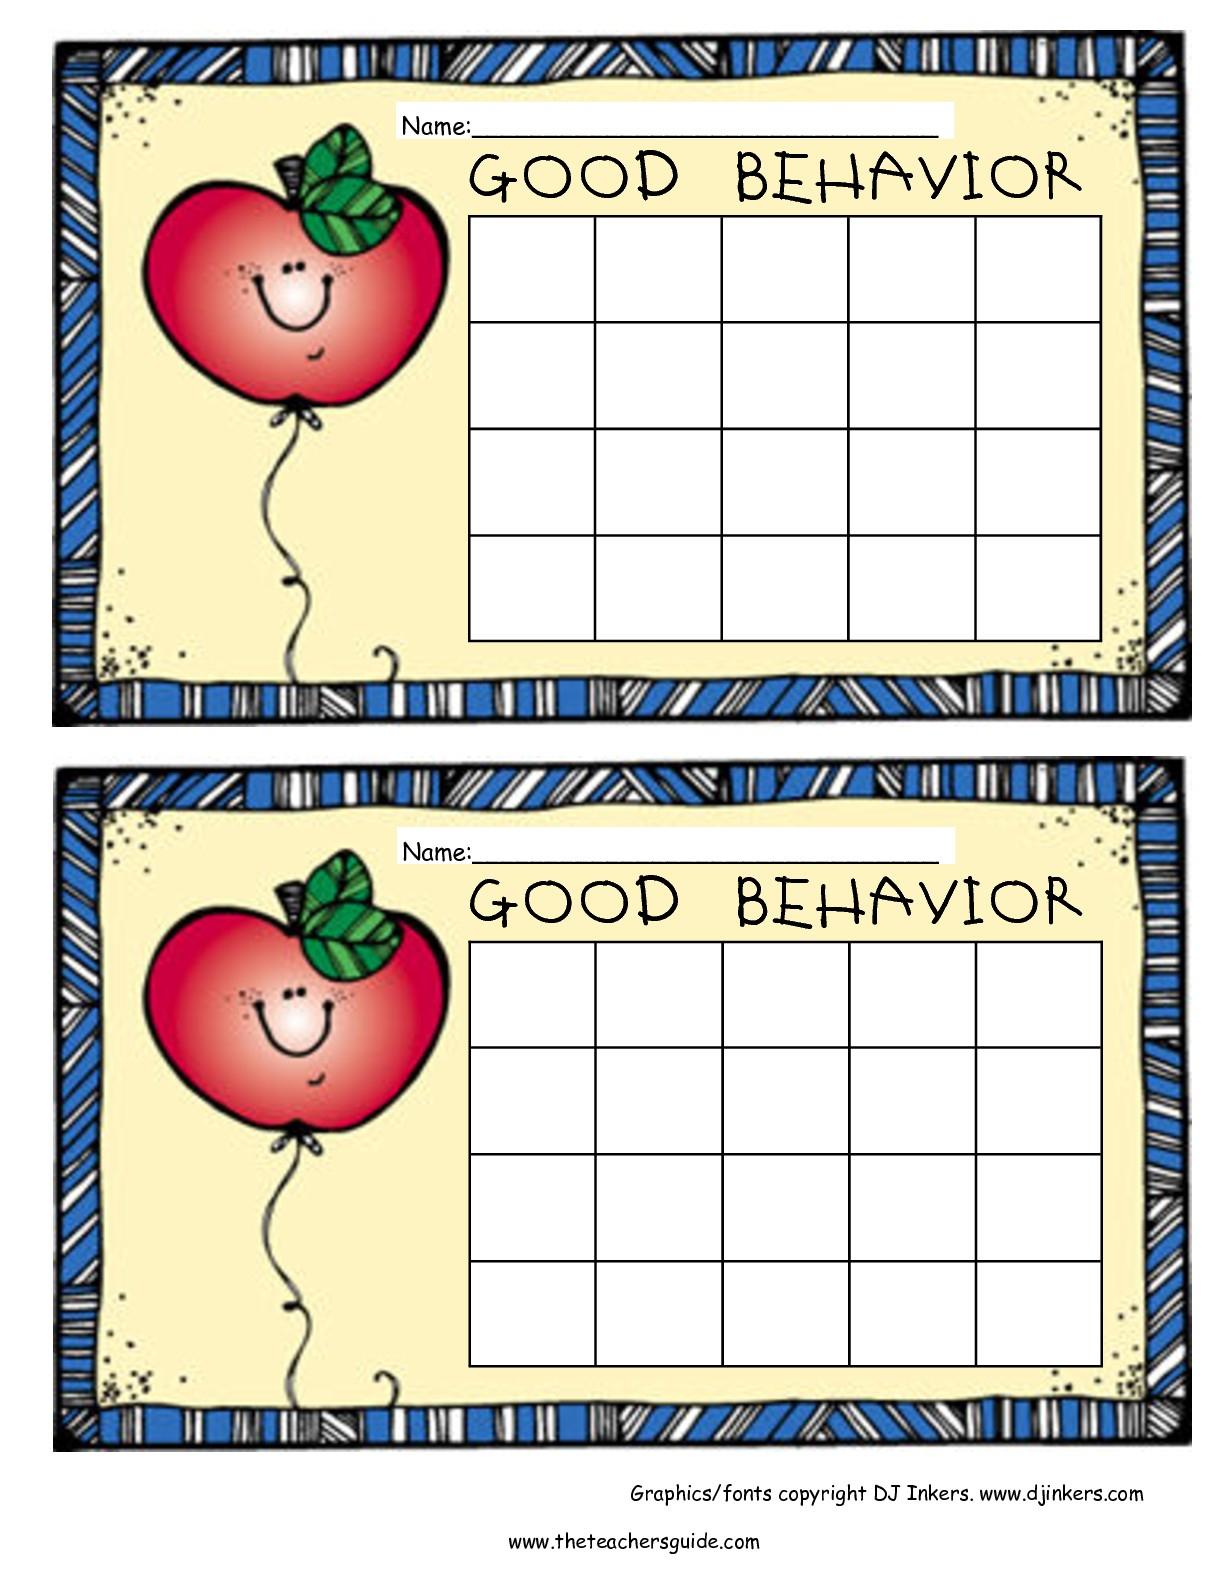 Free Printable Reward And Incentive Charts inside Free Printable Blank Behavior Charts